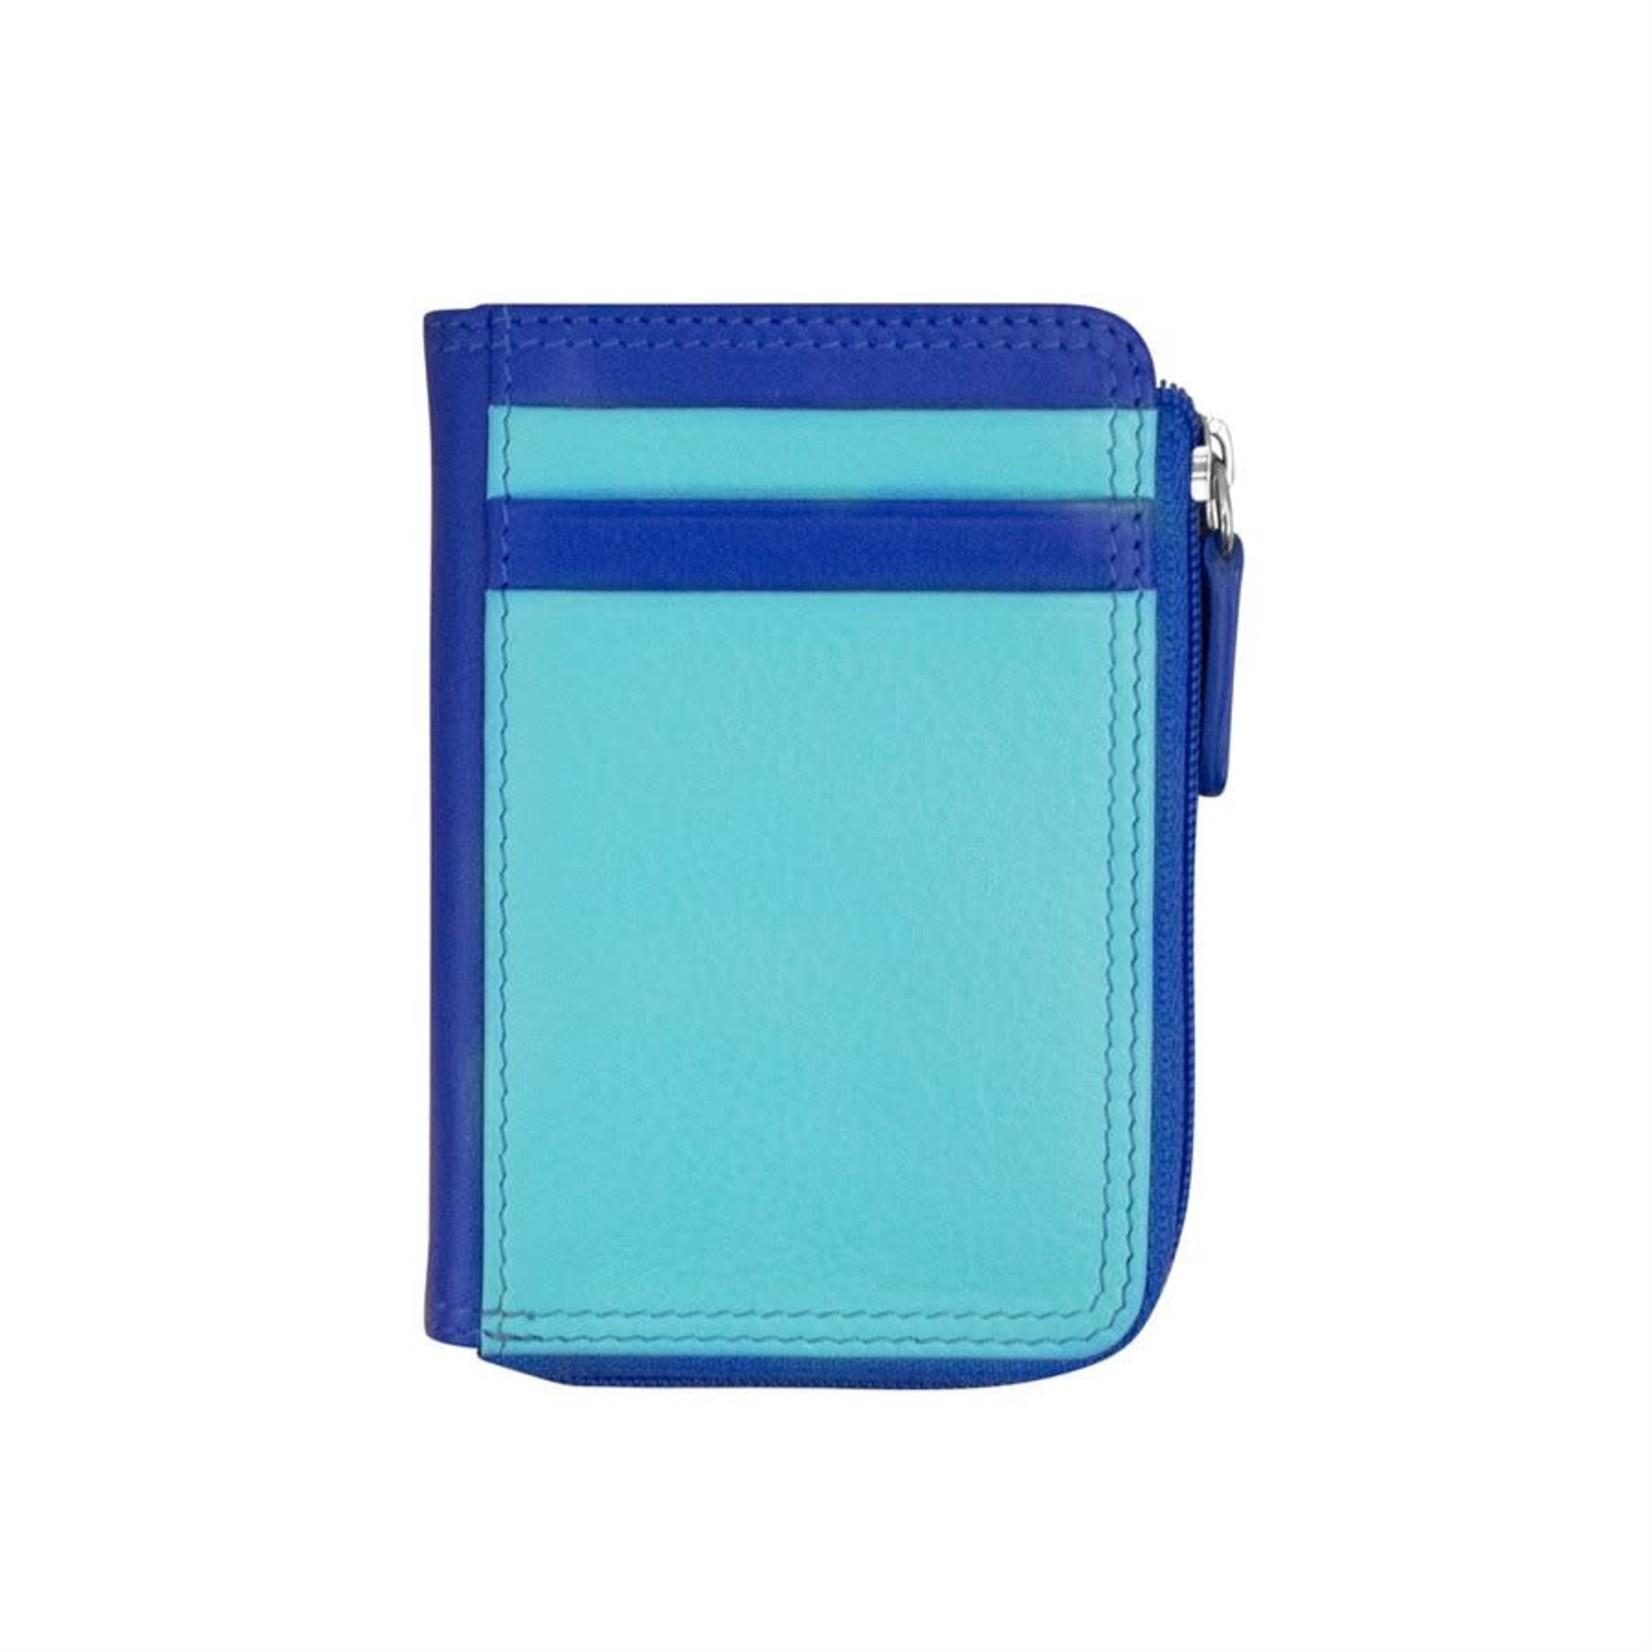 Leather Handbags and Accessories 7411 Mykonos - RFID CC ID Holder